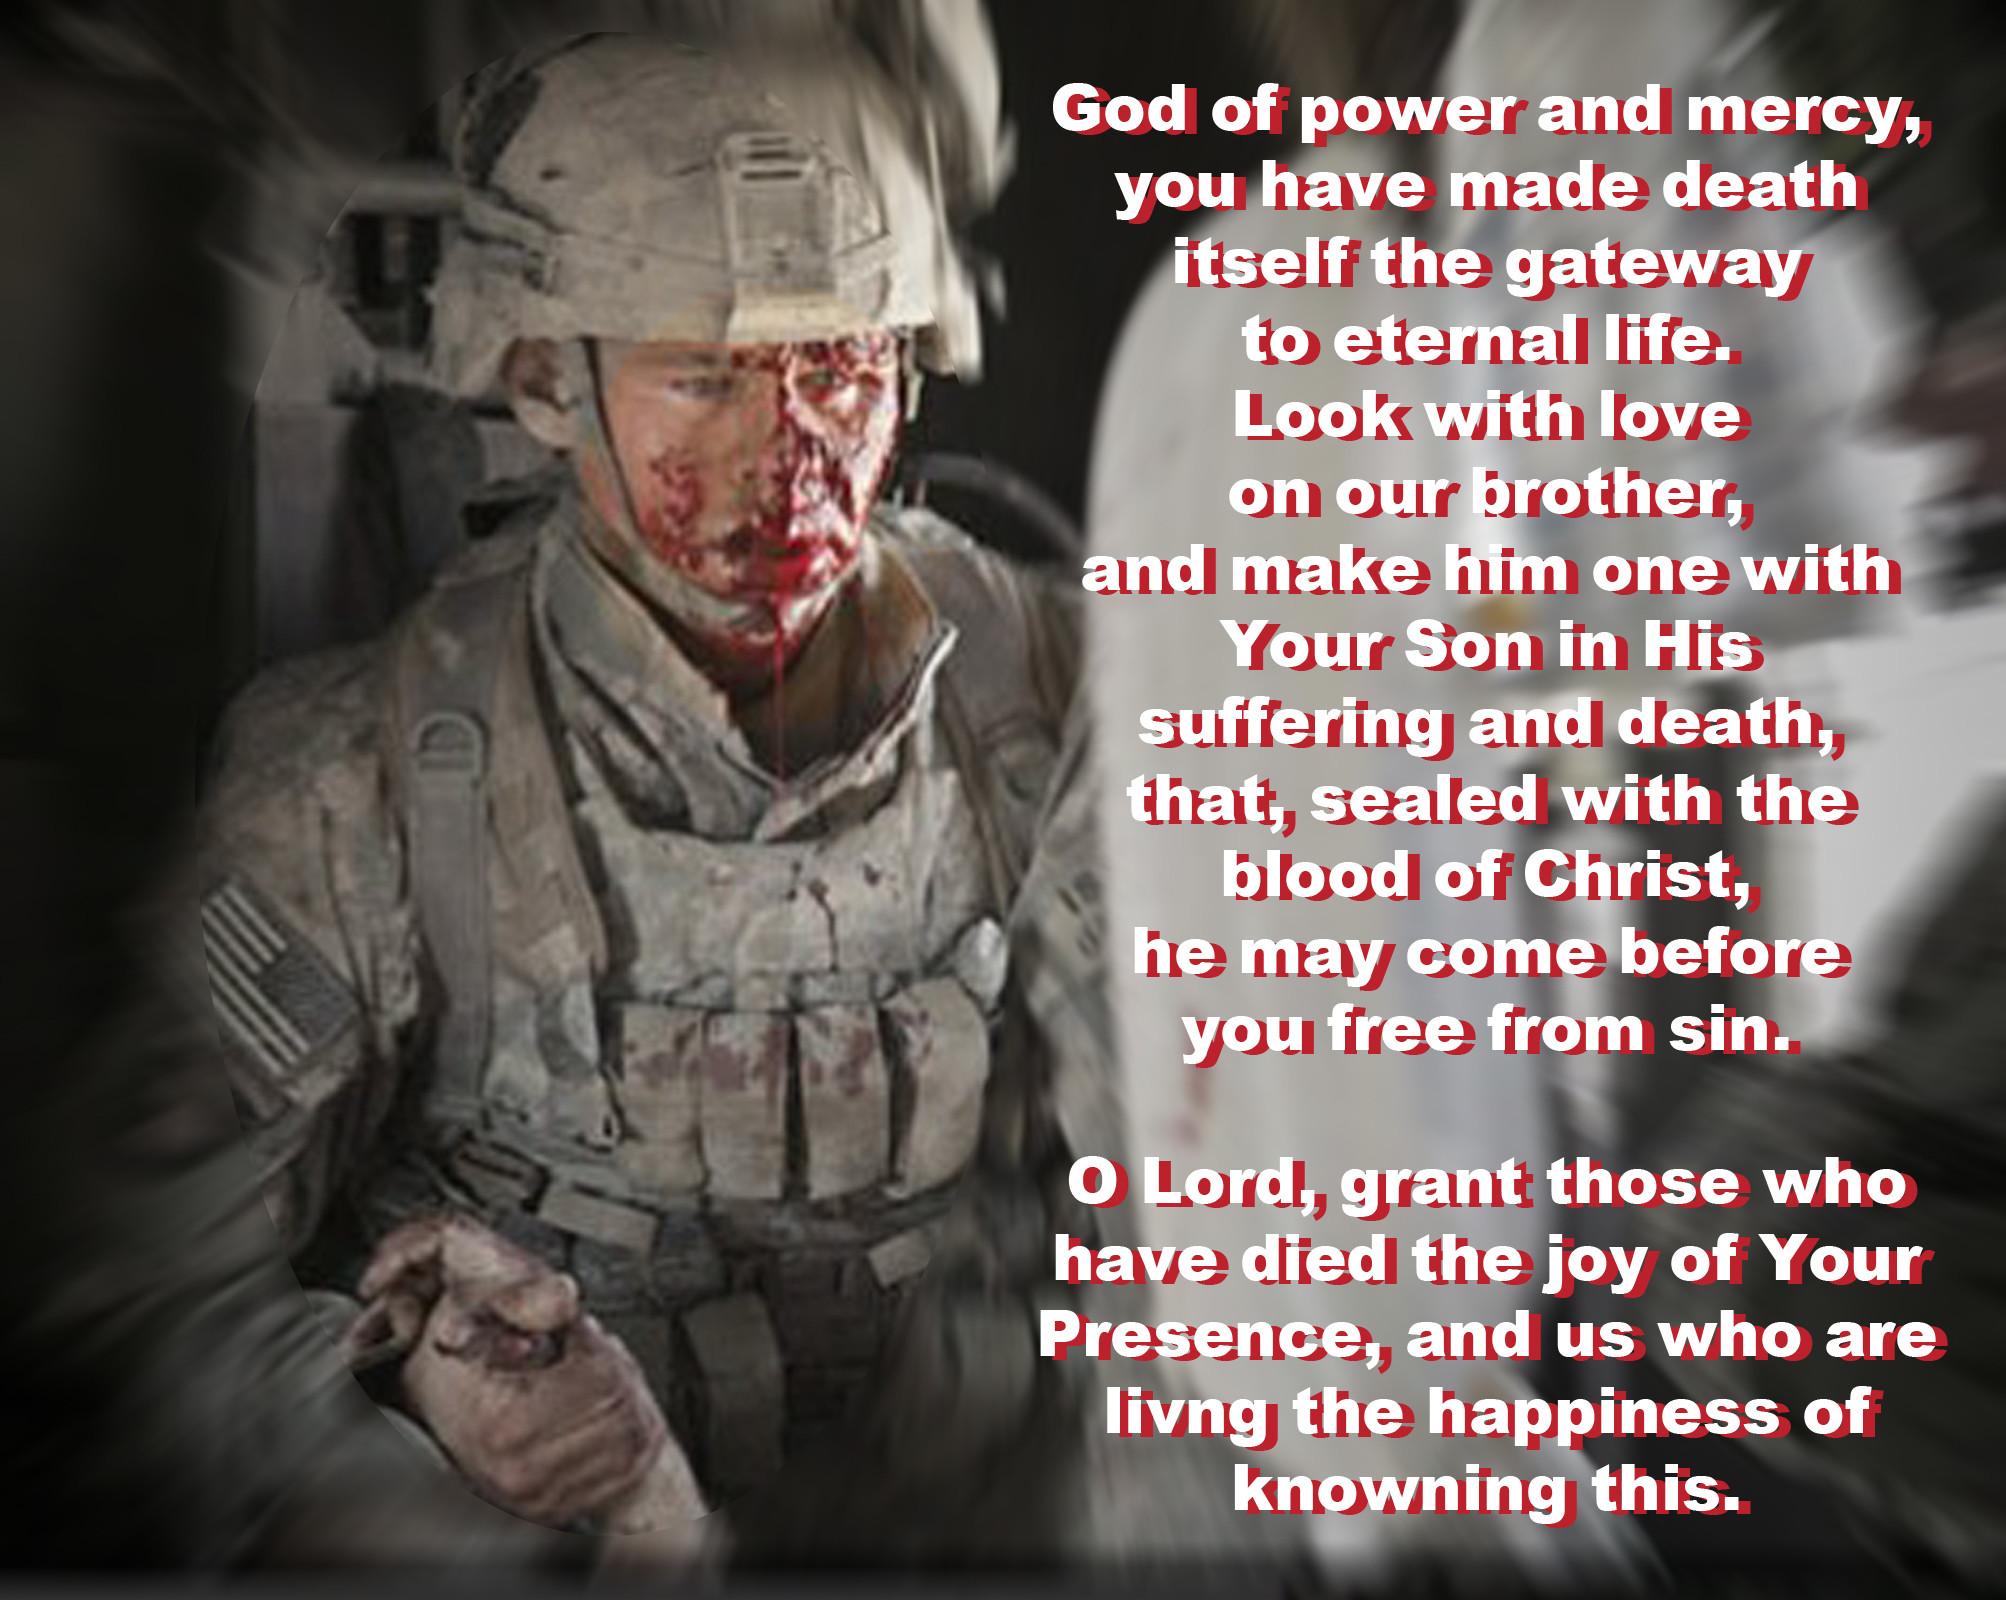 US Air Force – Prayer